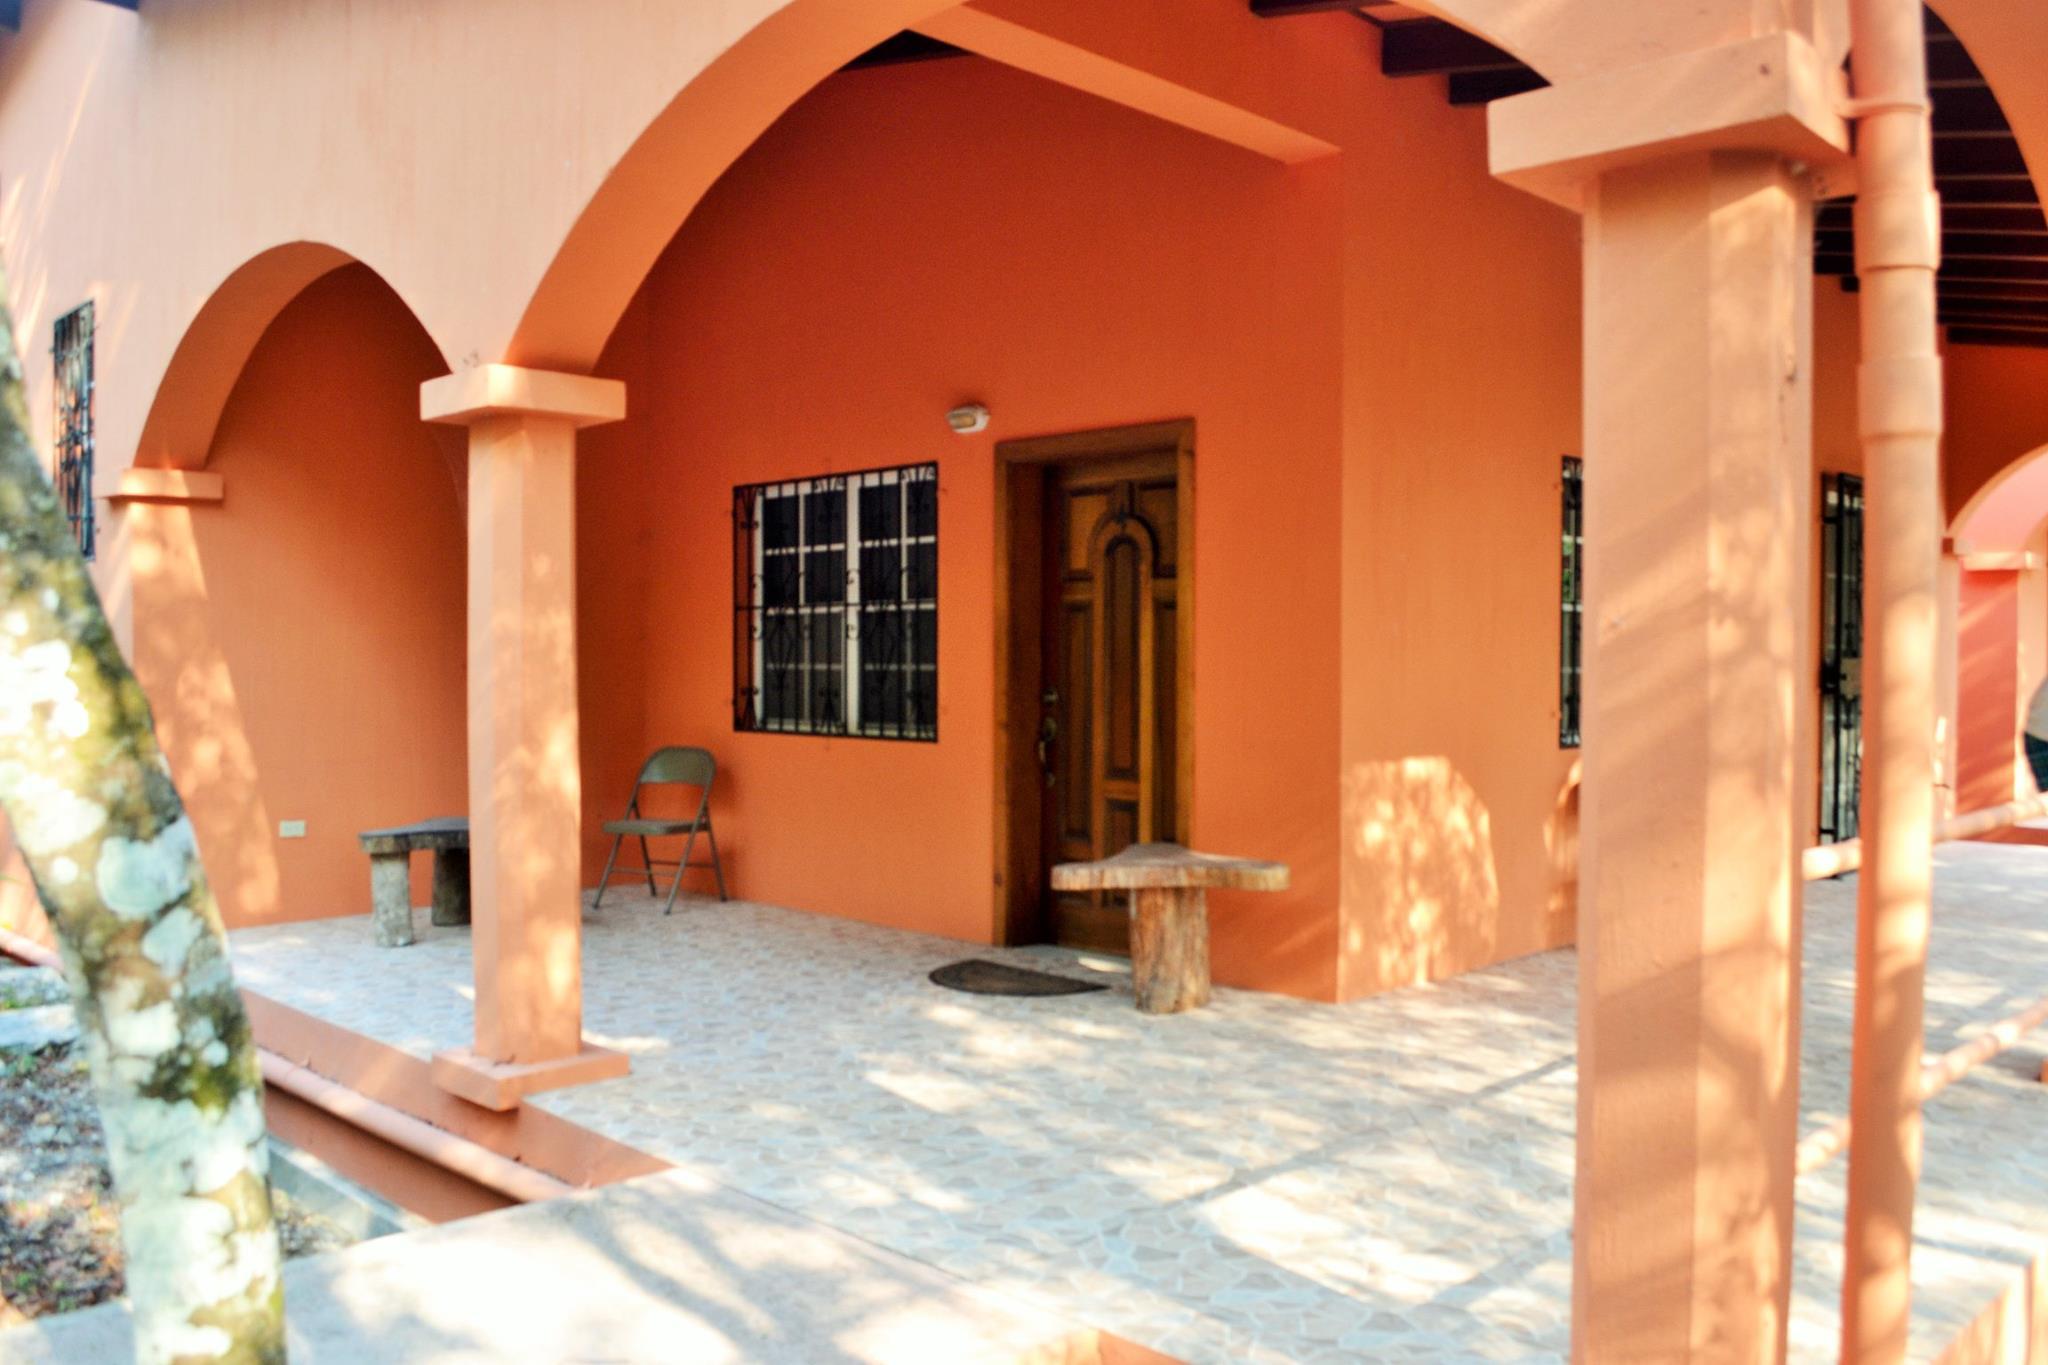 Two bedroom house near San Ignacio